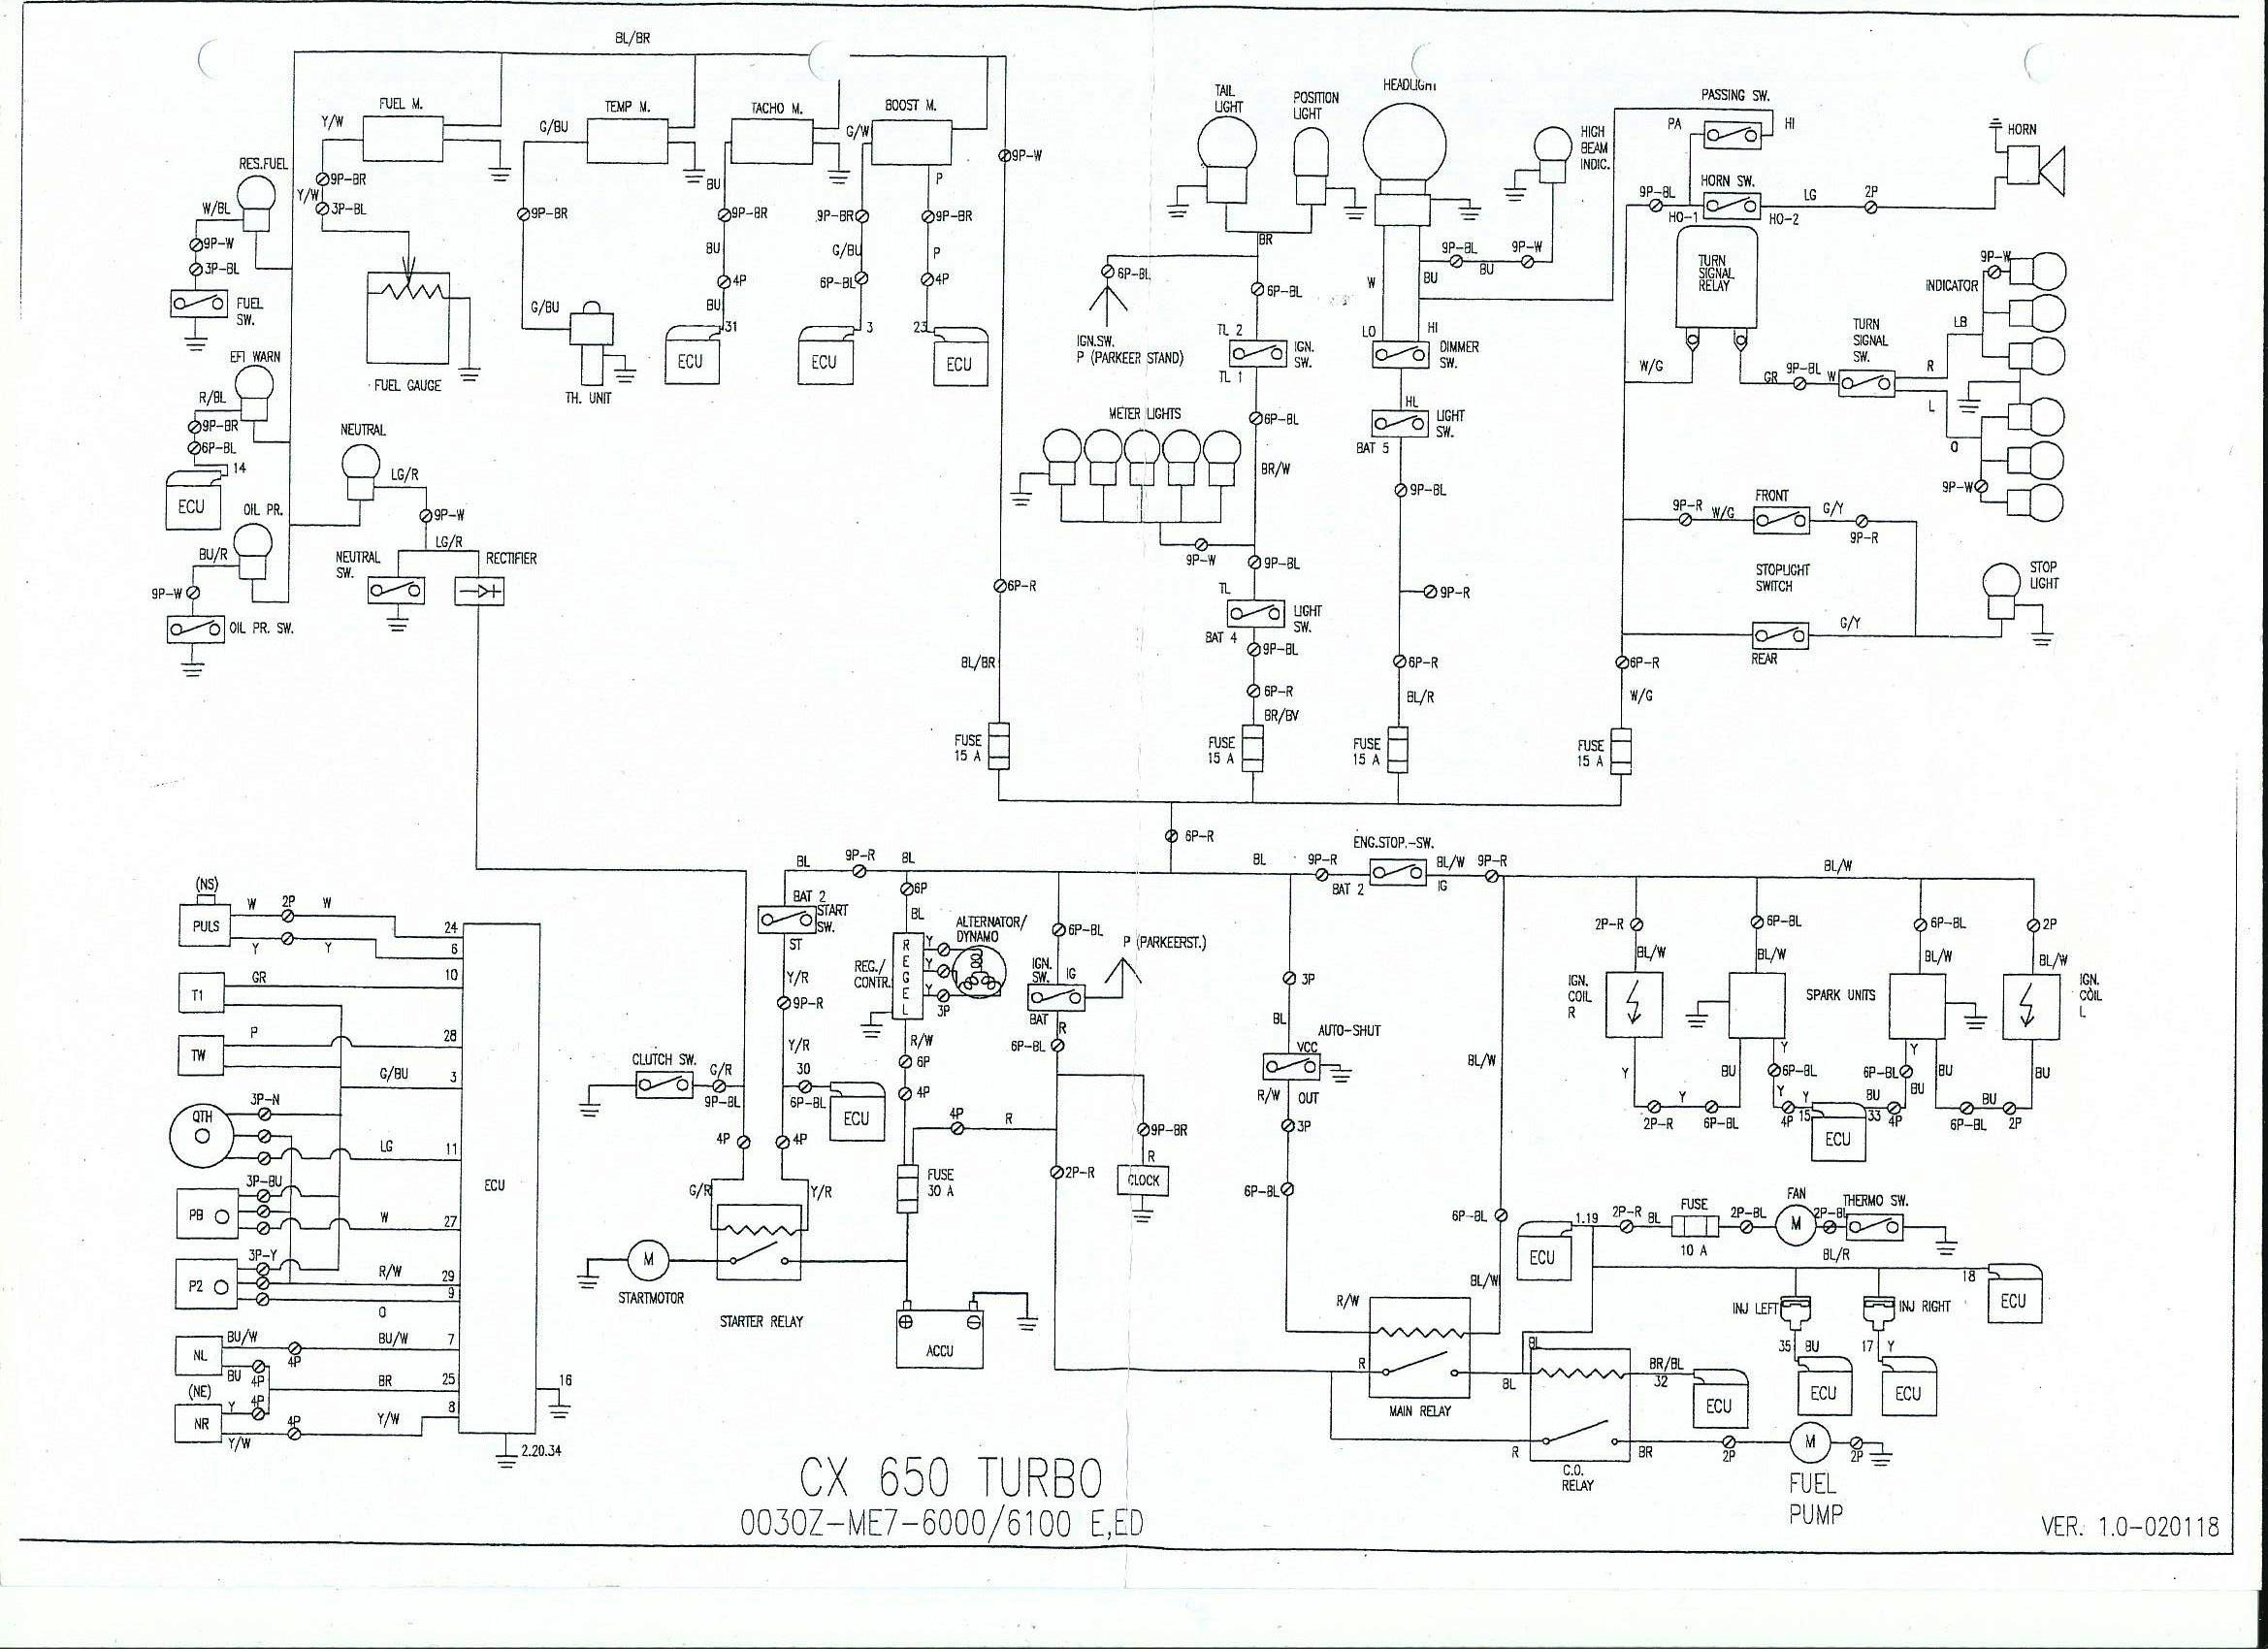 Wiring Diagram 650t